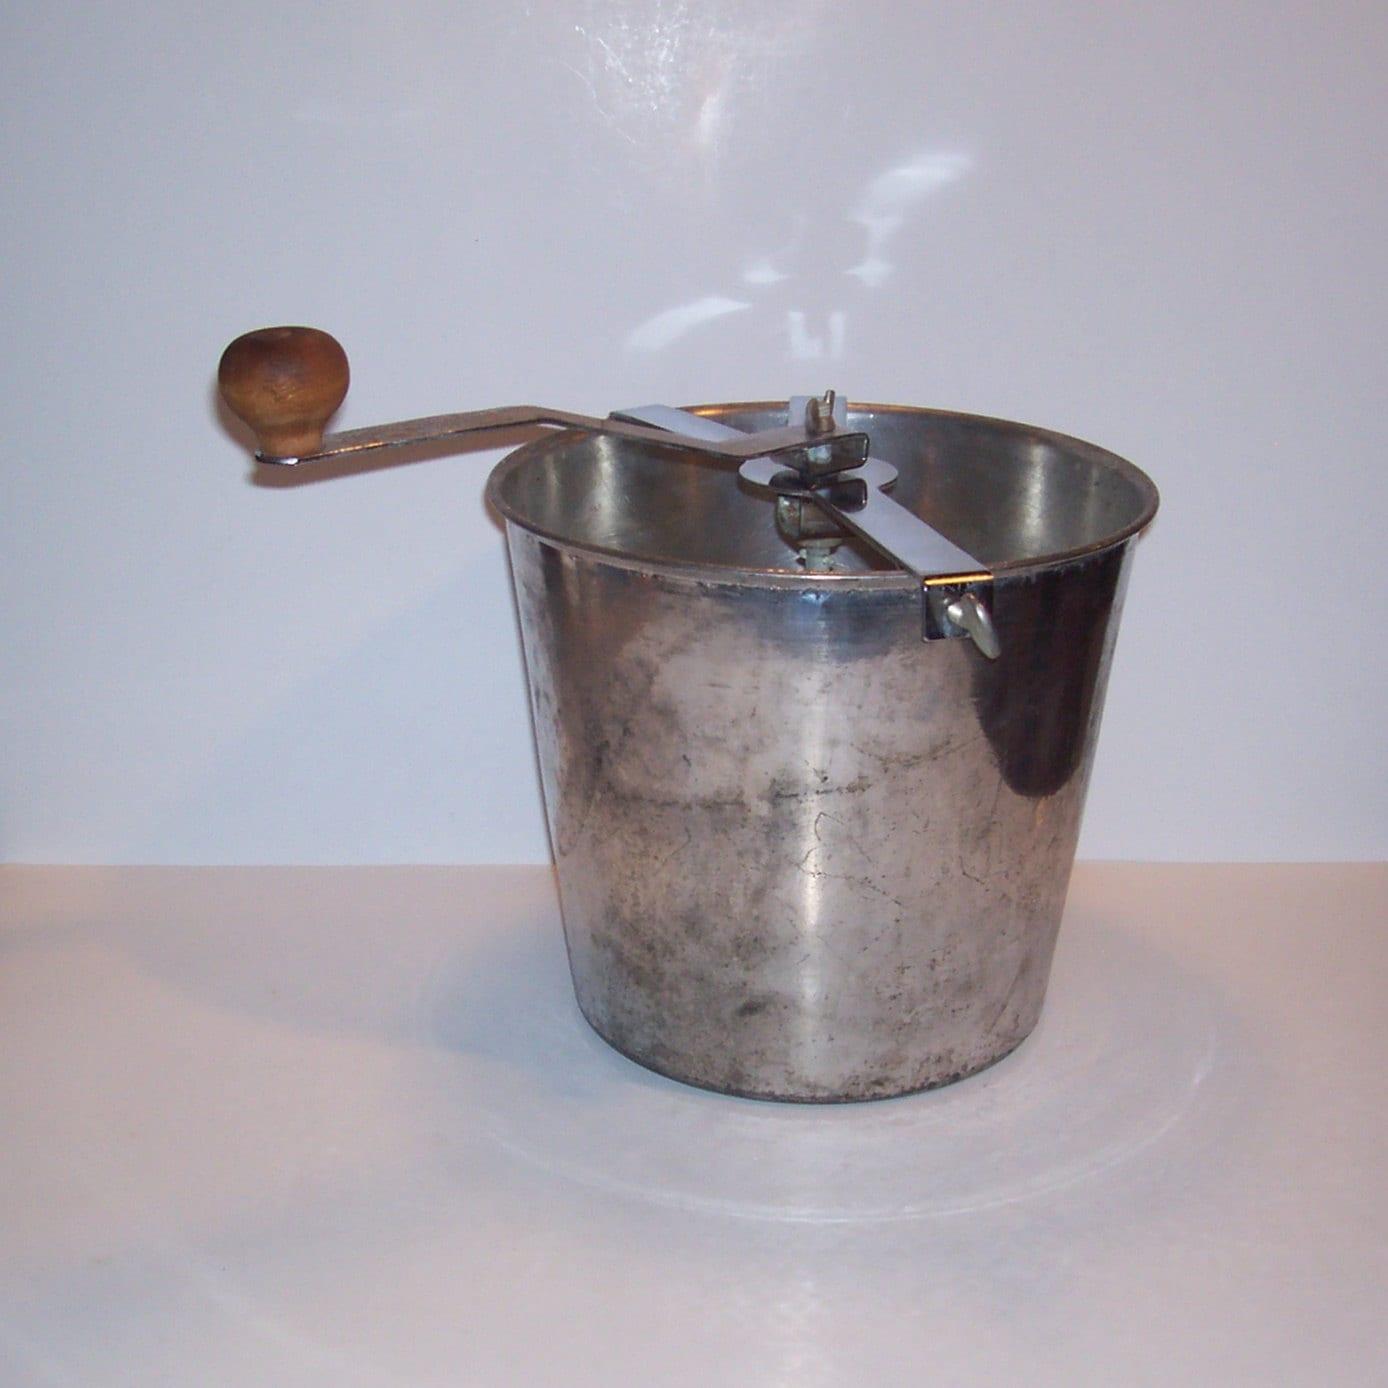 Vintage Bread Dough Mixer Maker Metal with Wood Handle